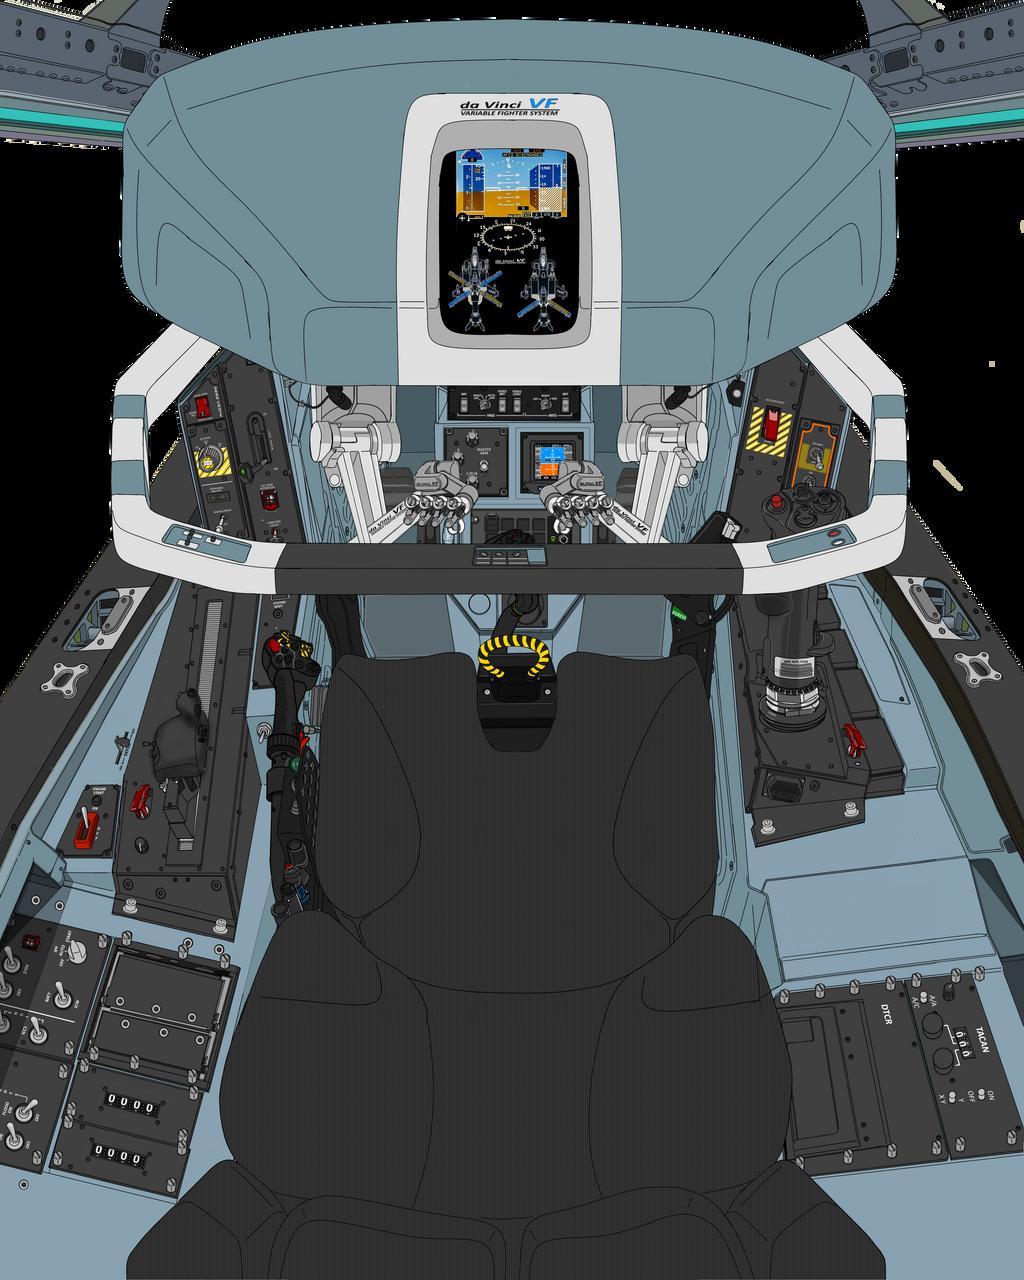 (Drogue parachute update) Block 50 cockpit-B